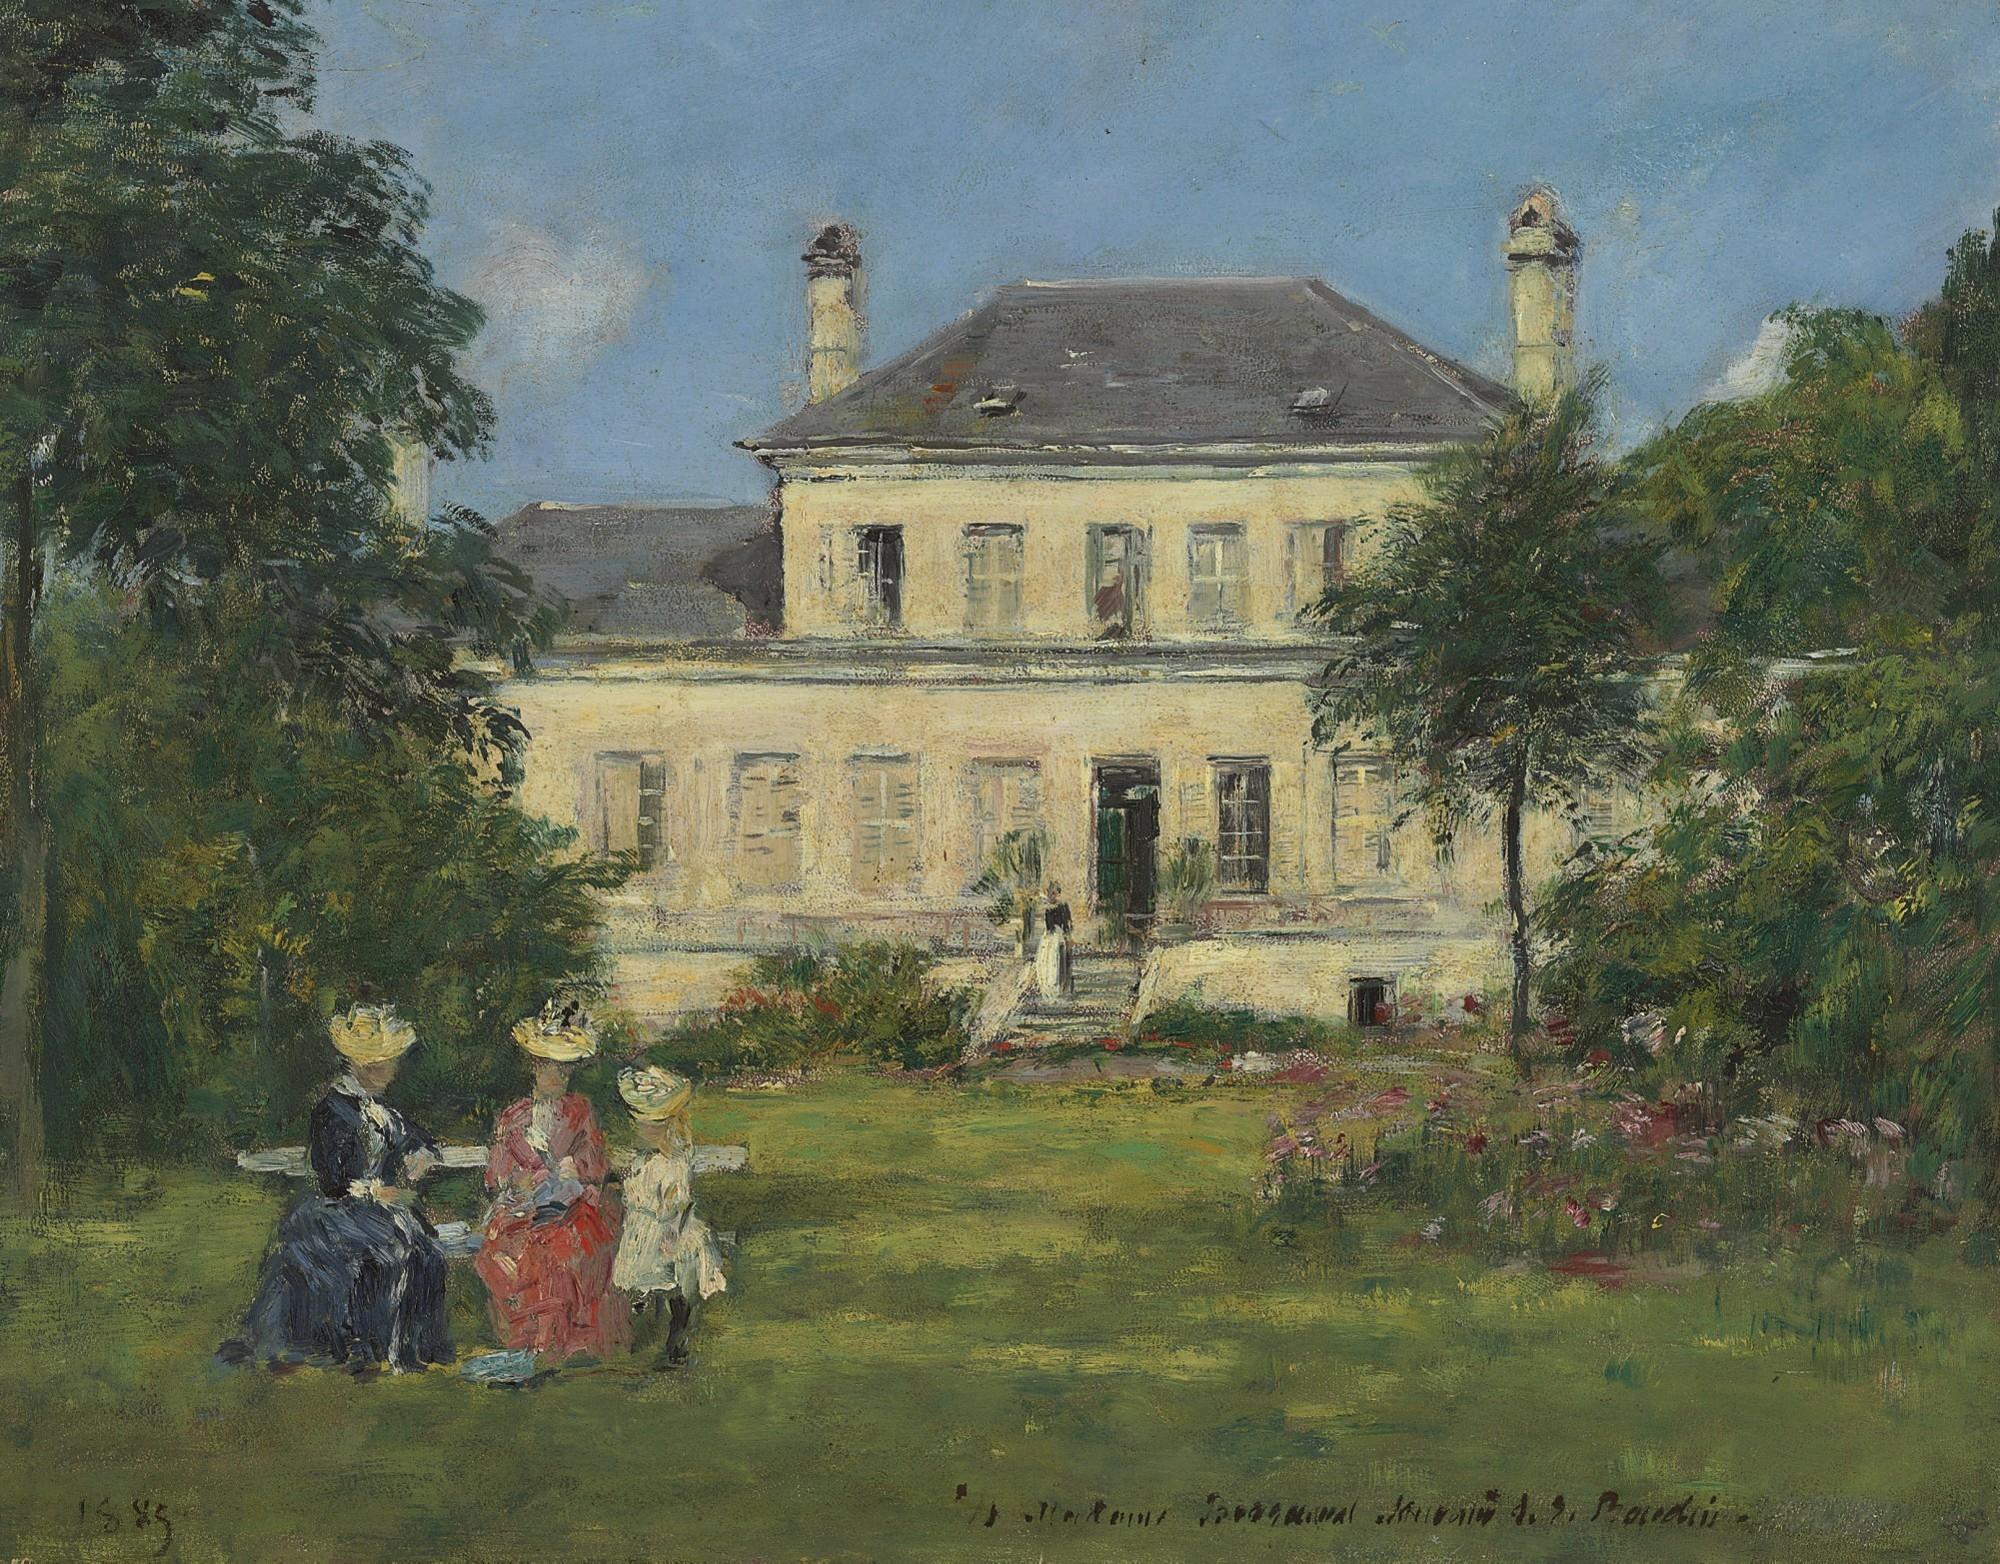 Datei:Eugène Boudin - Maison et jardin du peintre Braquaval.jpg ...